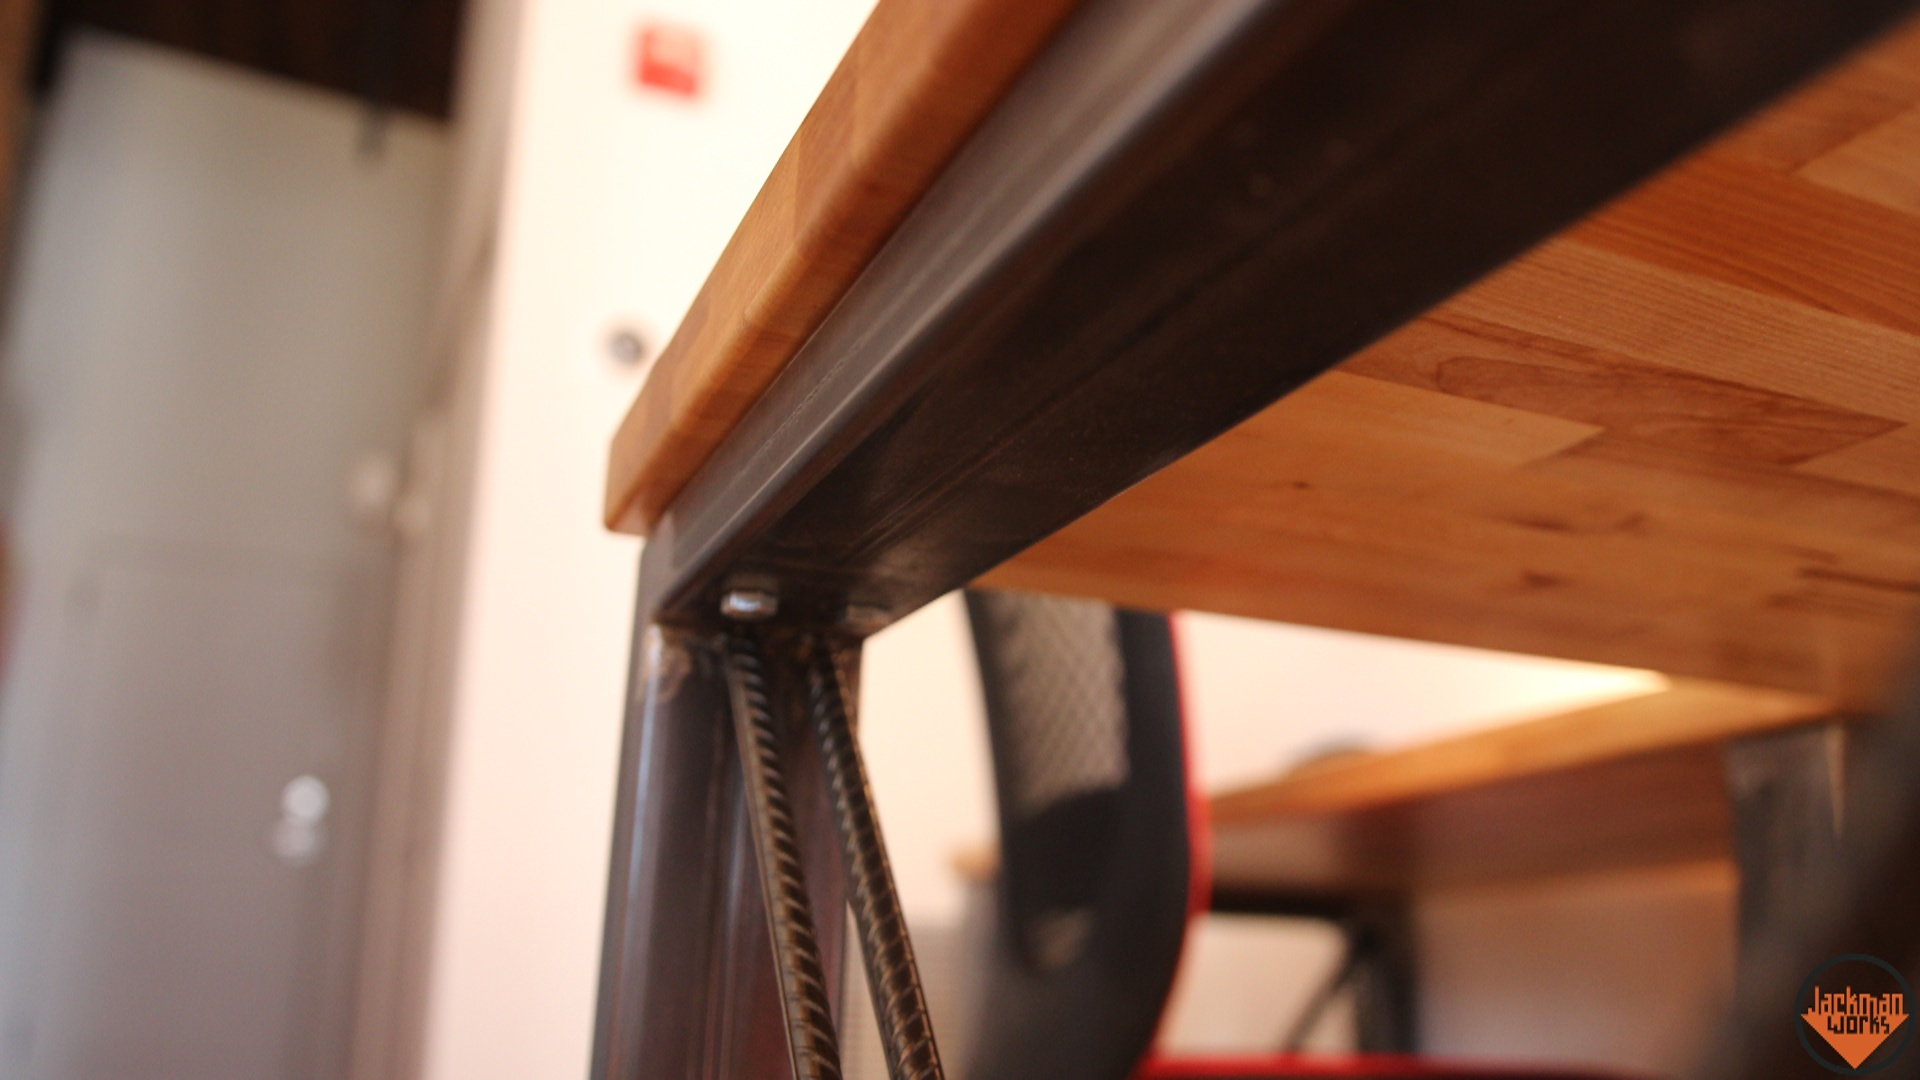 Industrial wood and metal desk 43 jackman works jackmanjackman worksindustrial desksteel deskwood and metal deskbutcherblock deskwaterloxdesktop finishcustom deskdiyhow to industrialinterior solutioingenieria Images